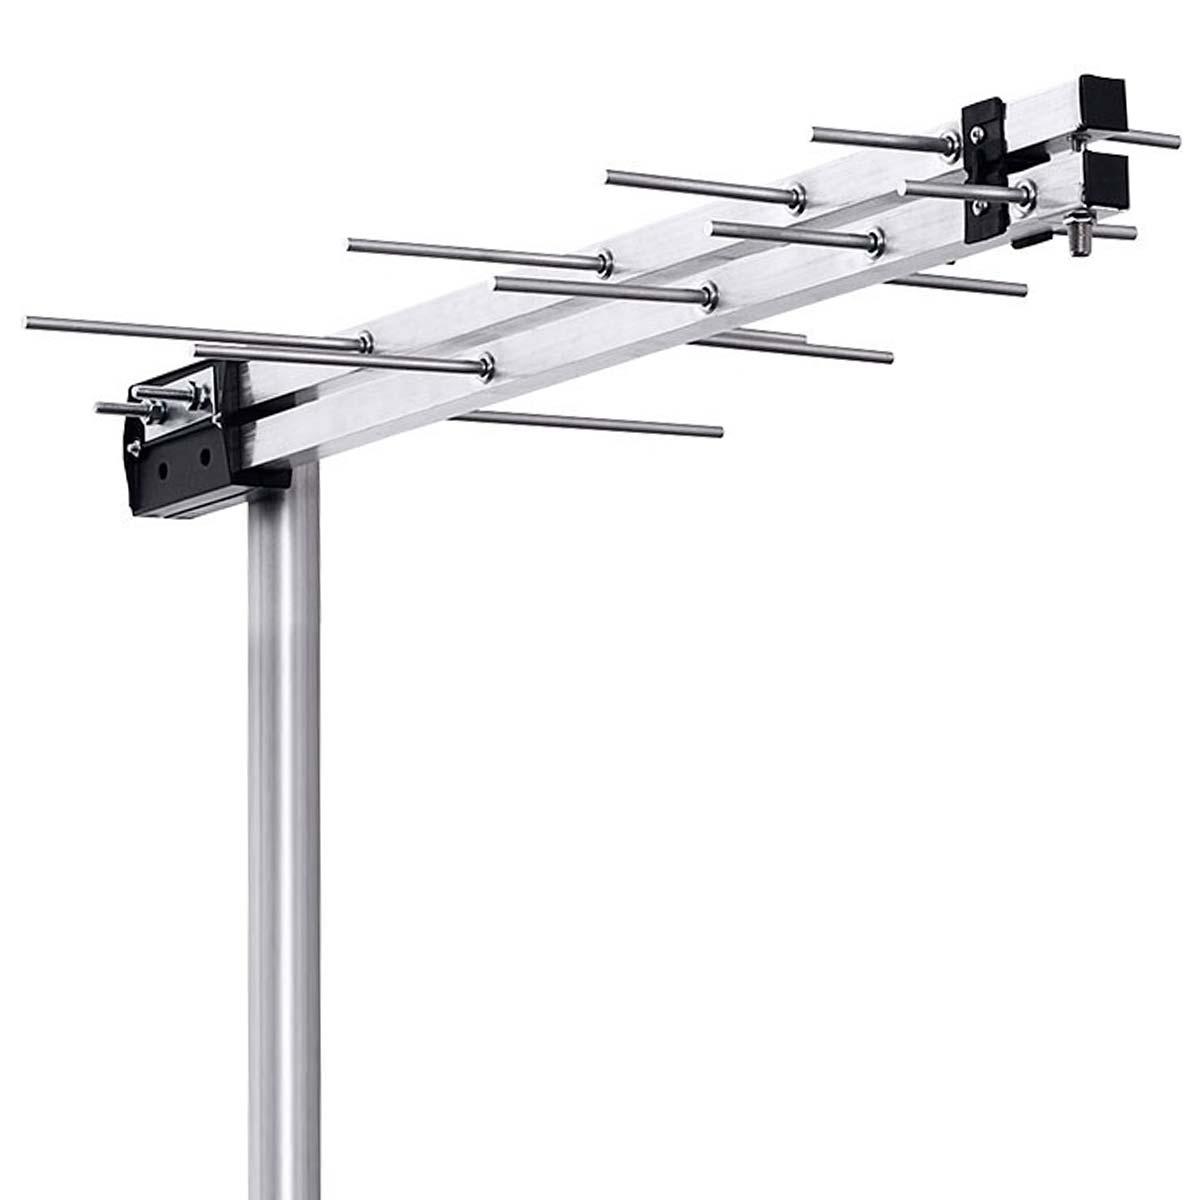 LU 8M - Antena Externa Log Peri�dica LU8M Aqu�rio